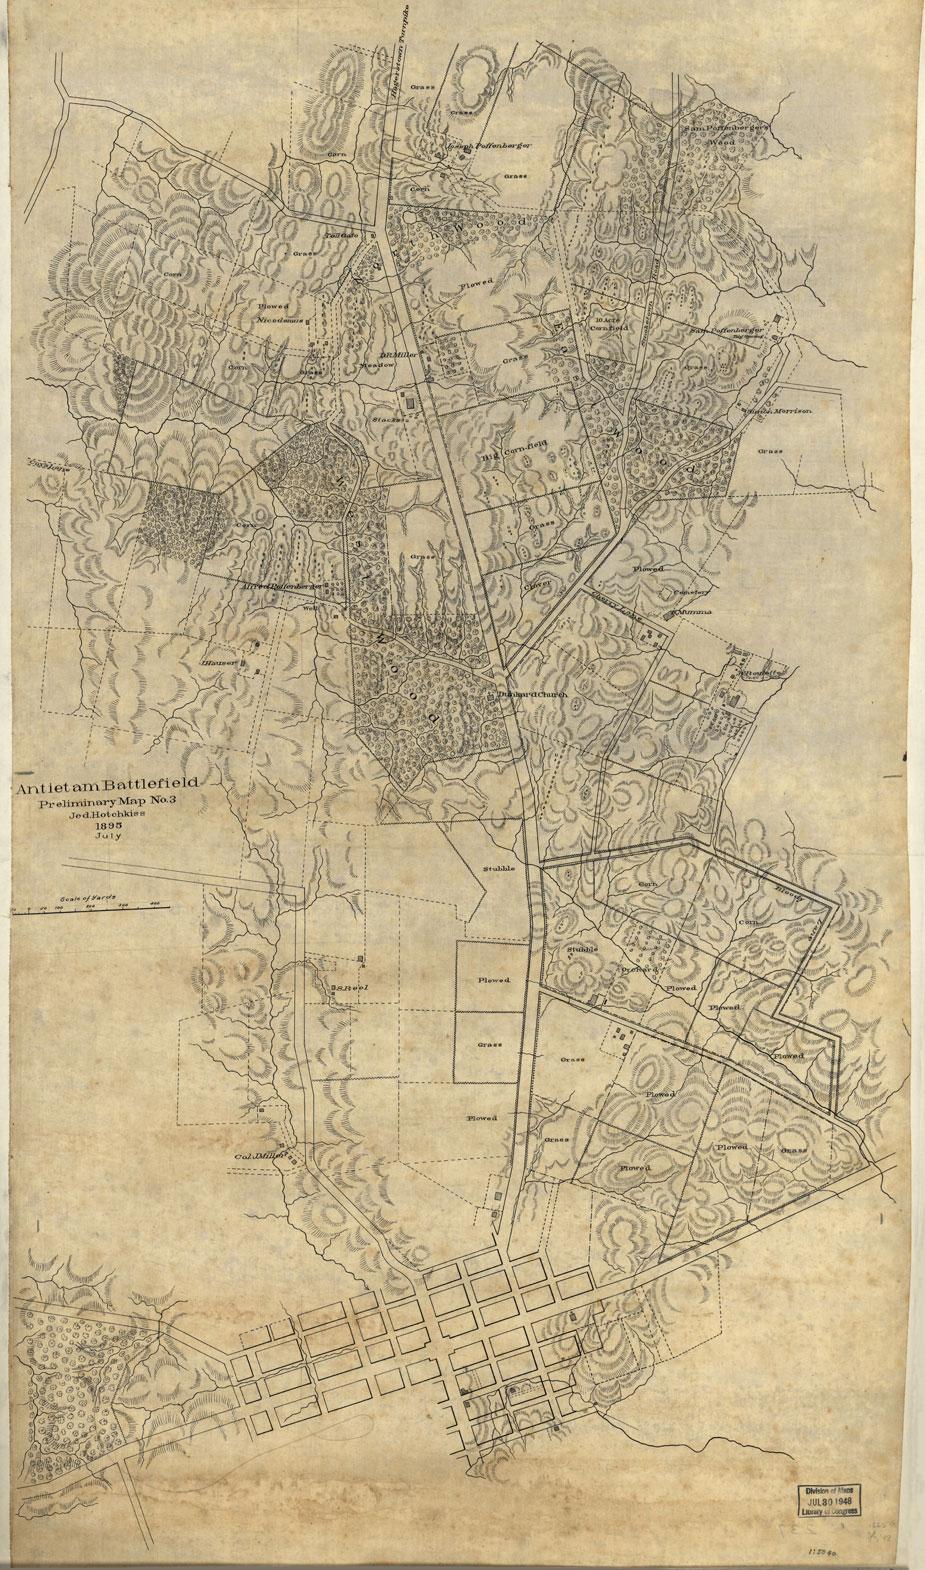 Antietam Battlefield - Preliminary map No. 3